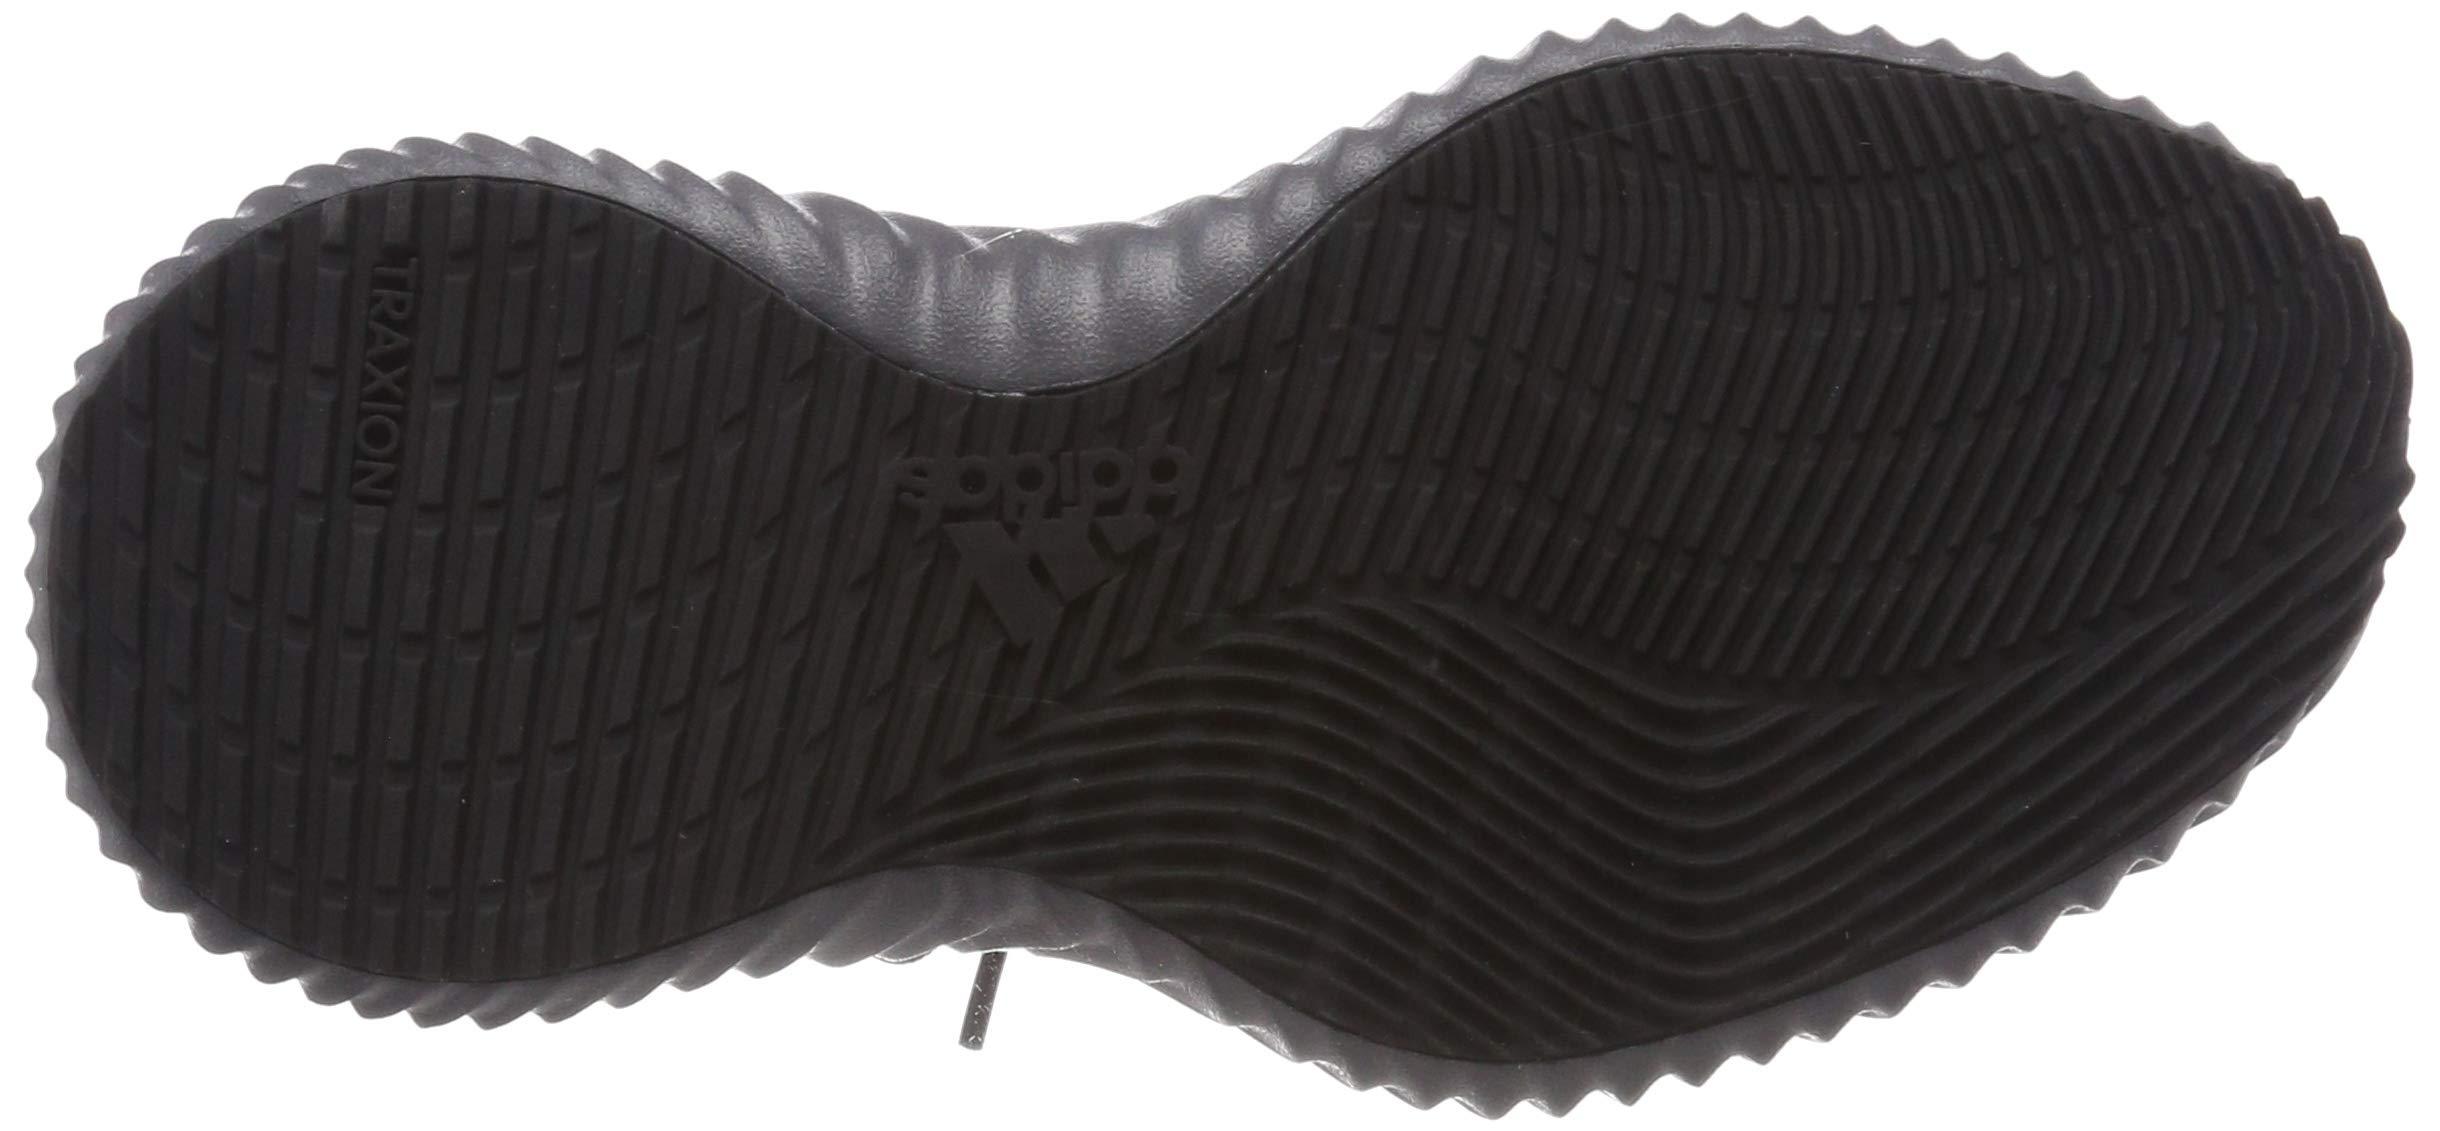 Adidas Alphabounce Trainer W 3 spesavip